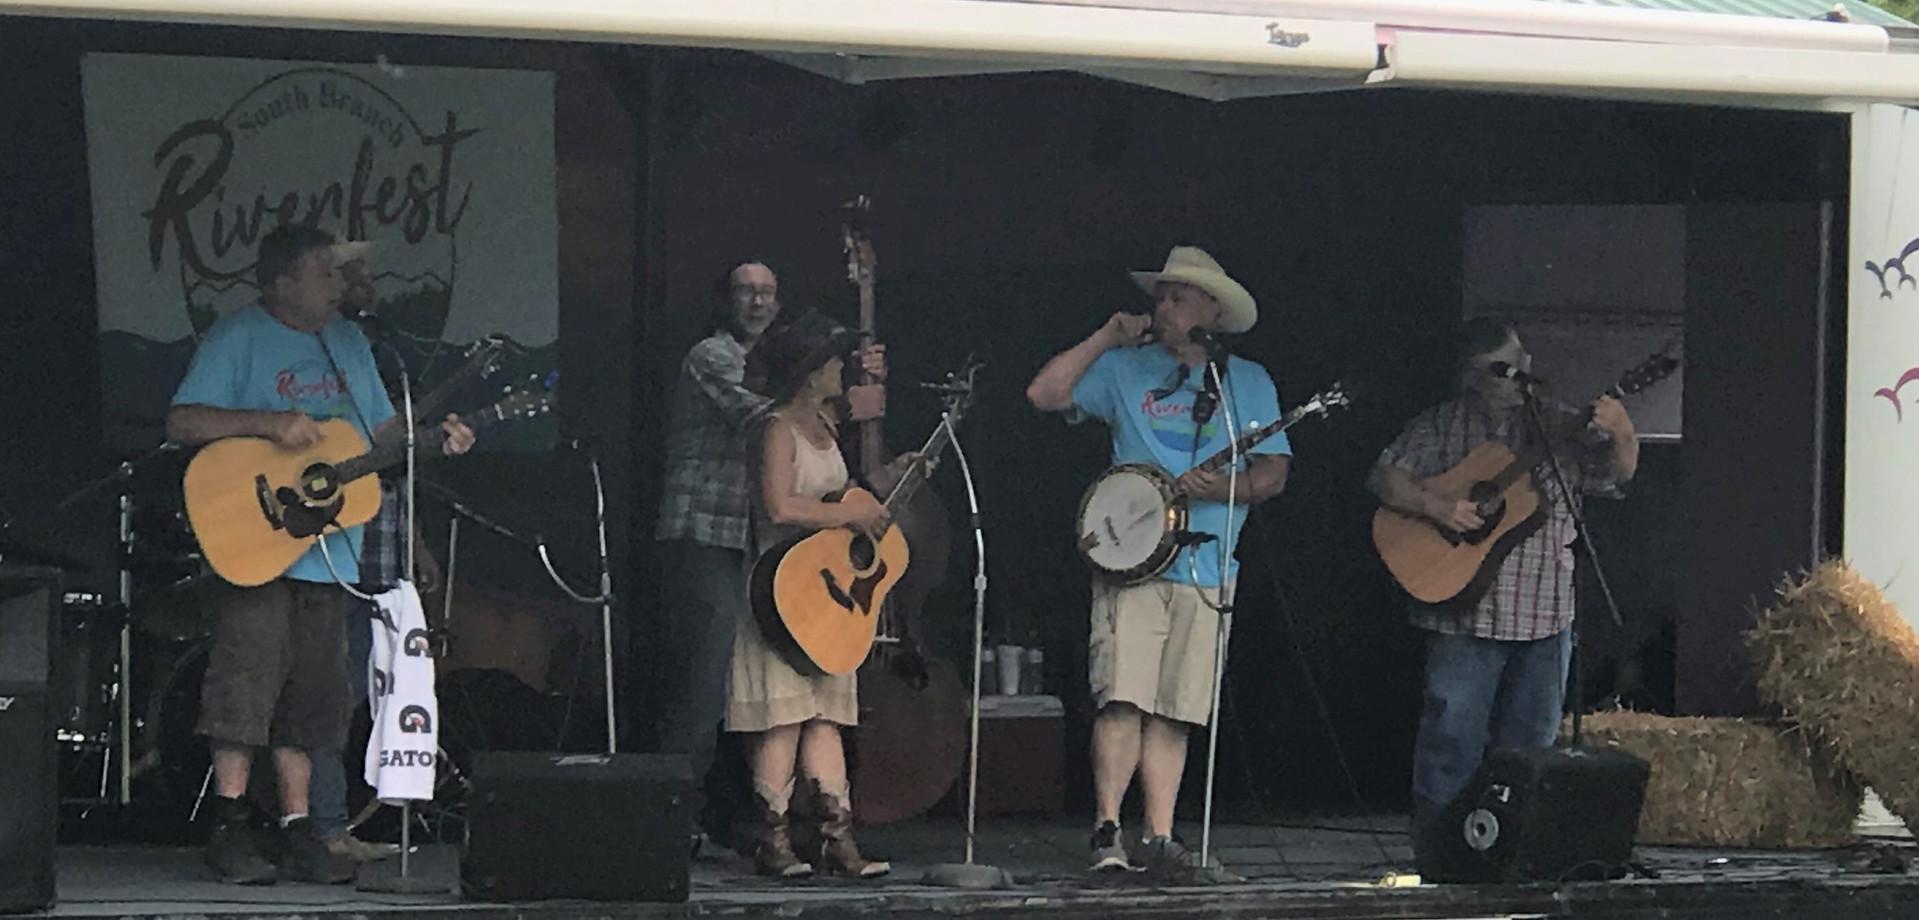 Keplinger Family on the stage